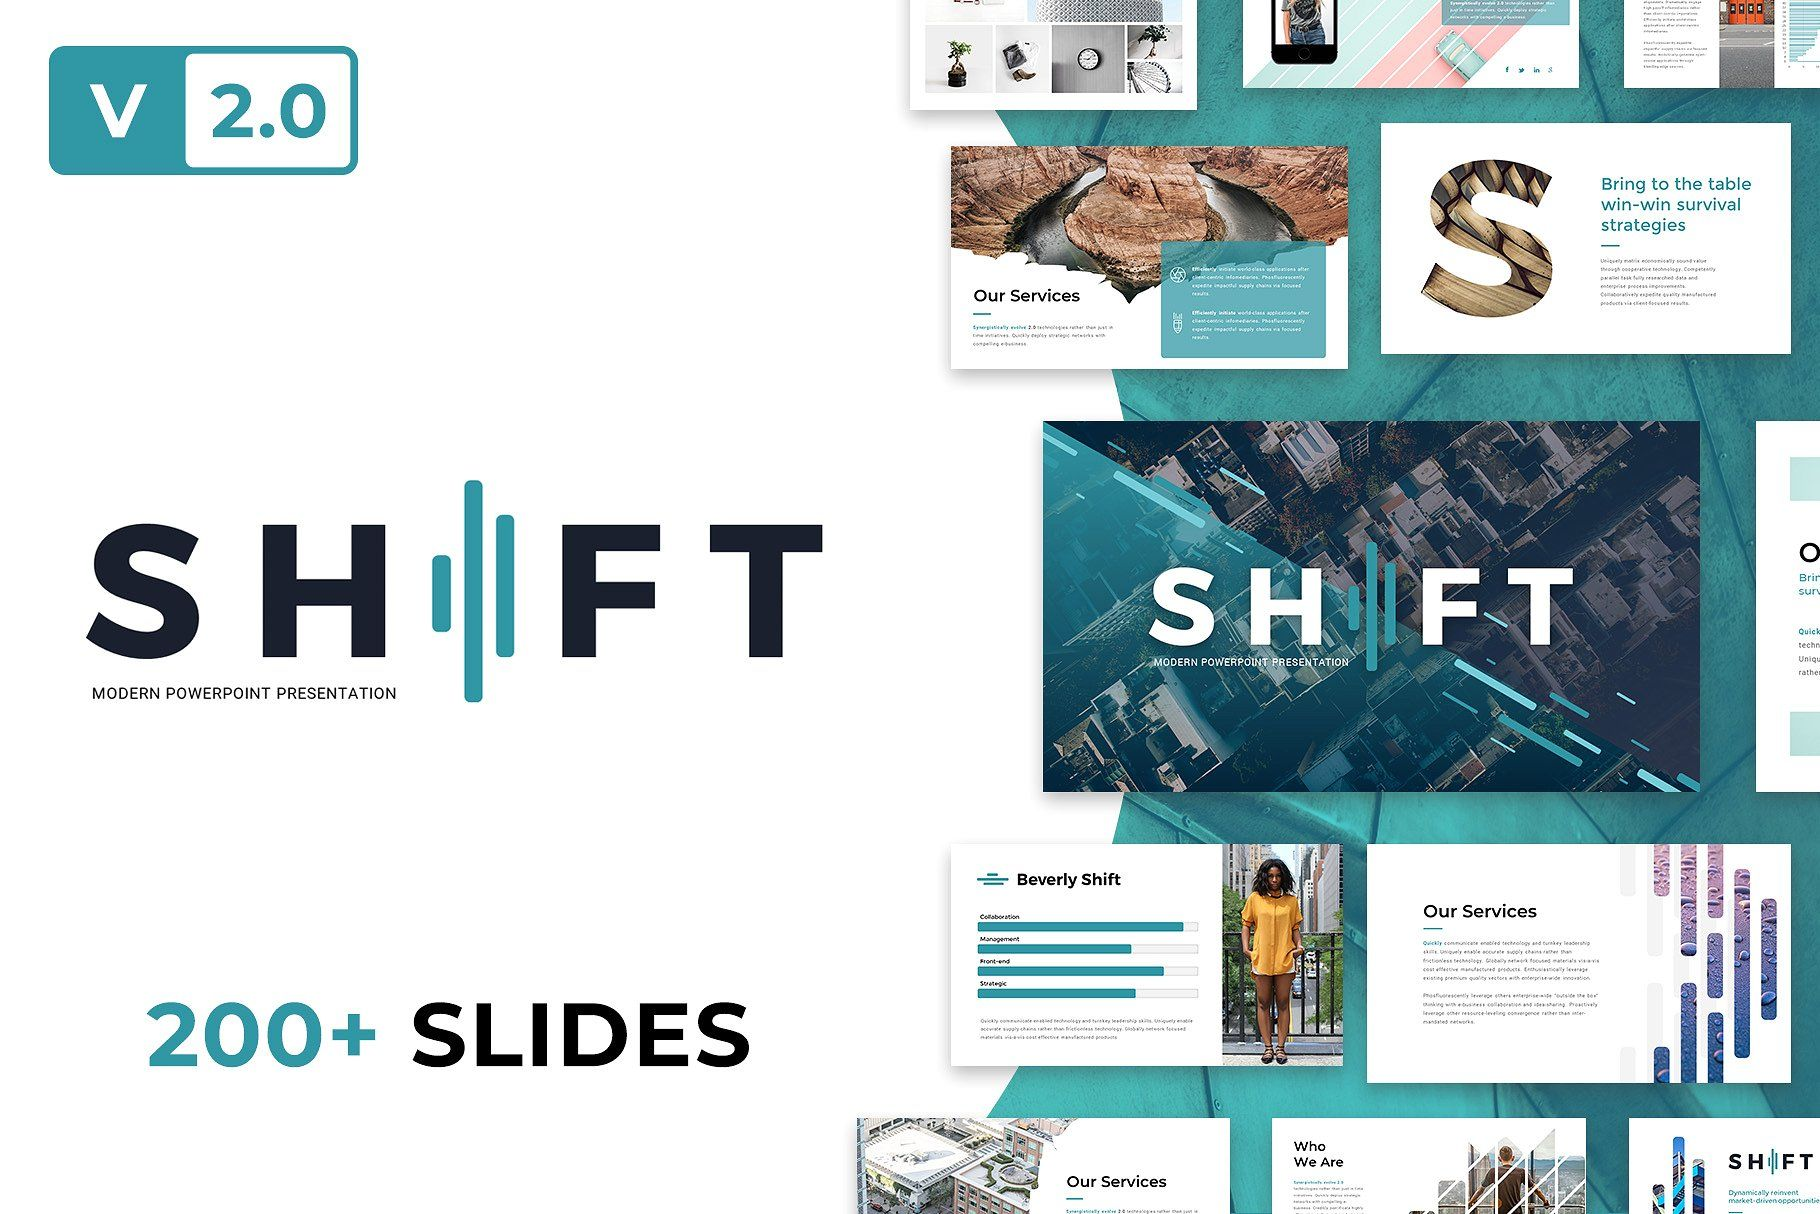 Shift Modern Powerpoint Template Powerpoint templates